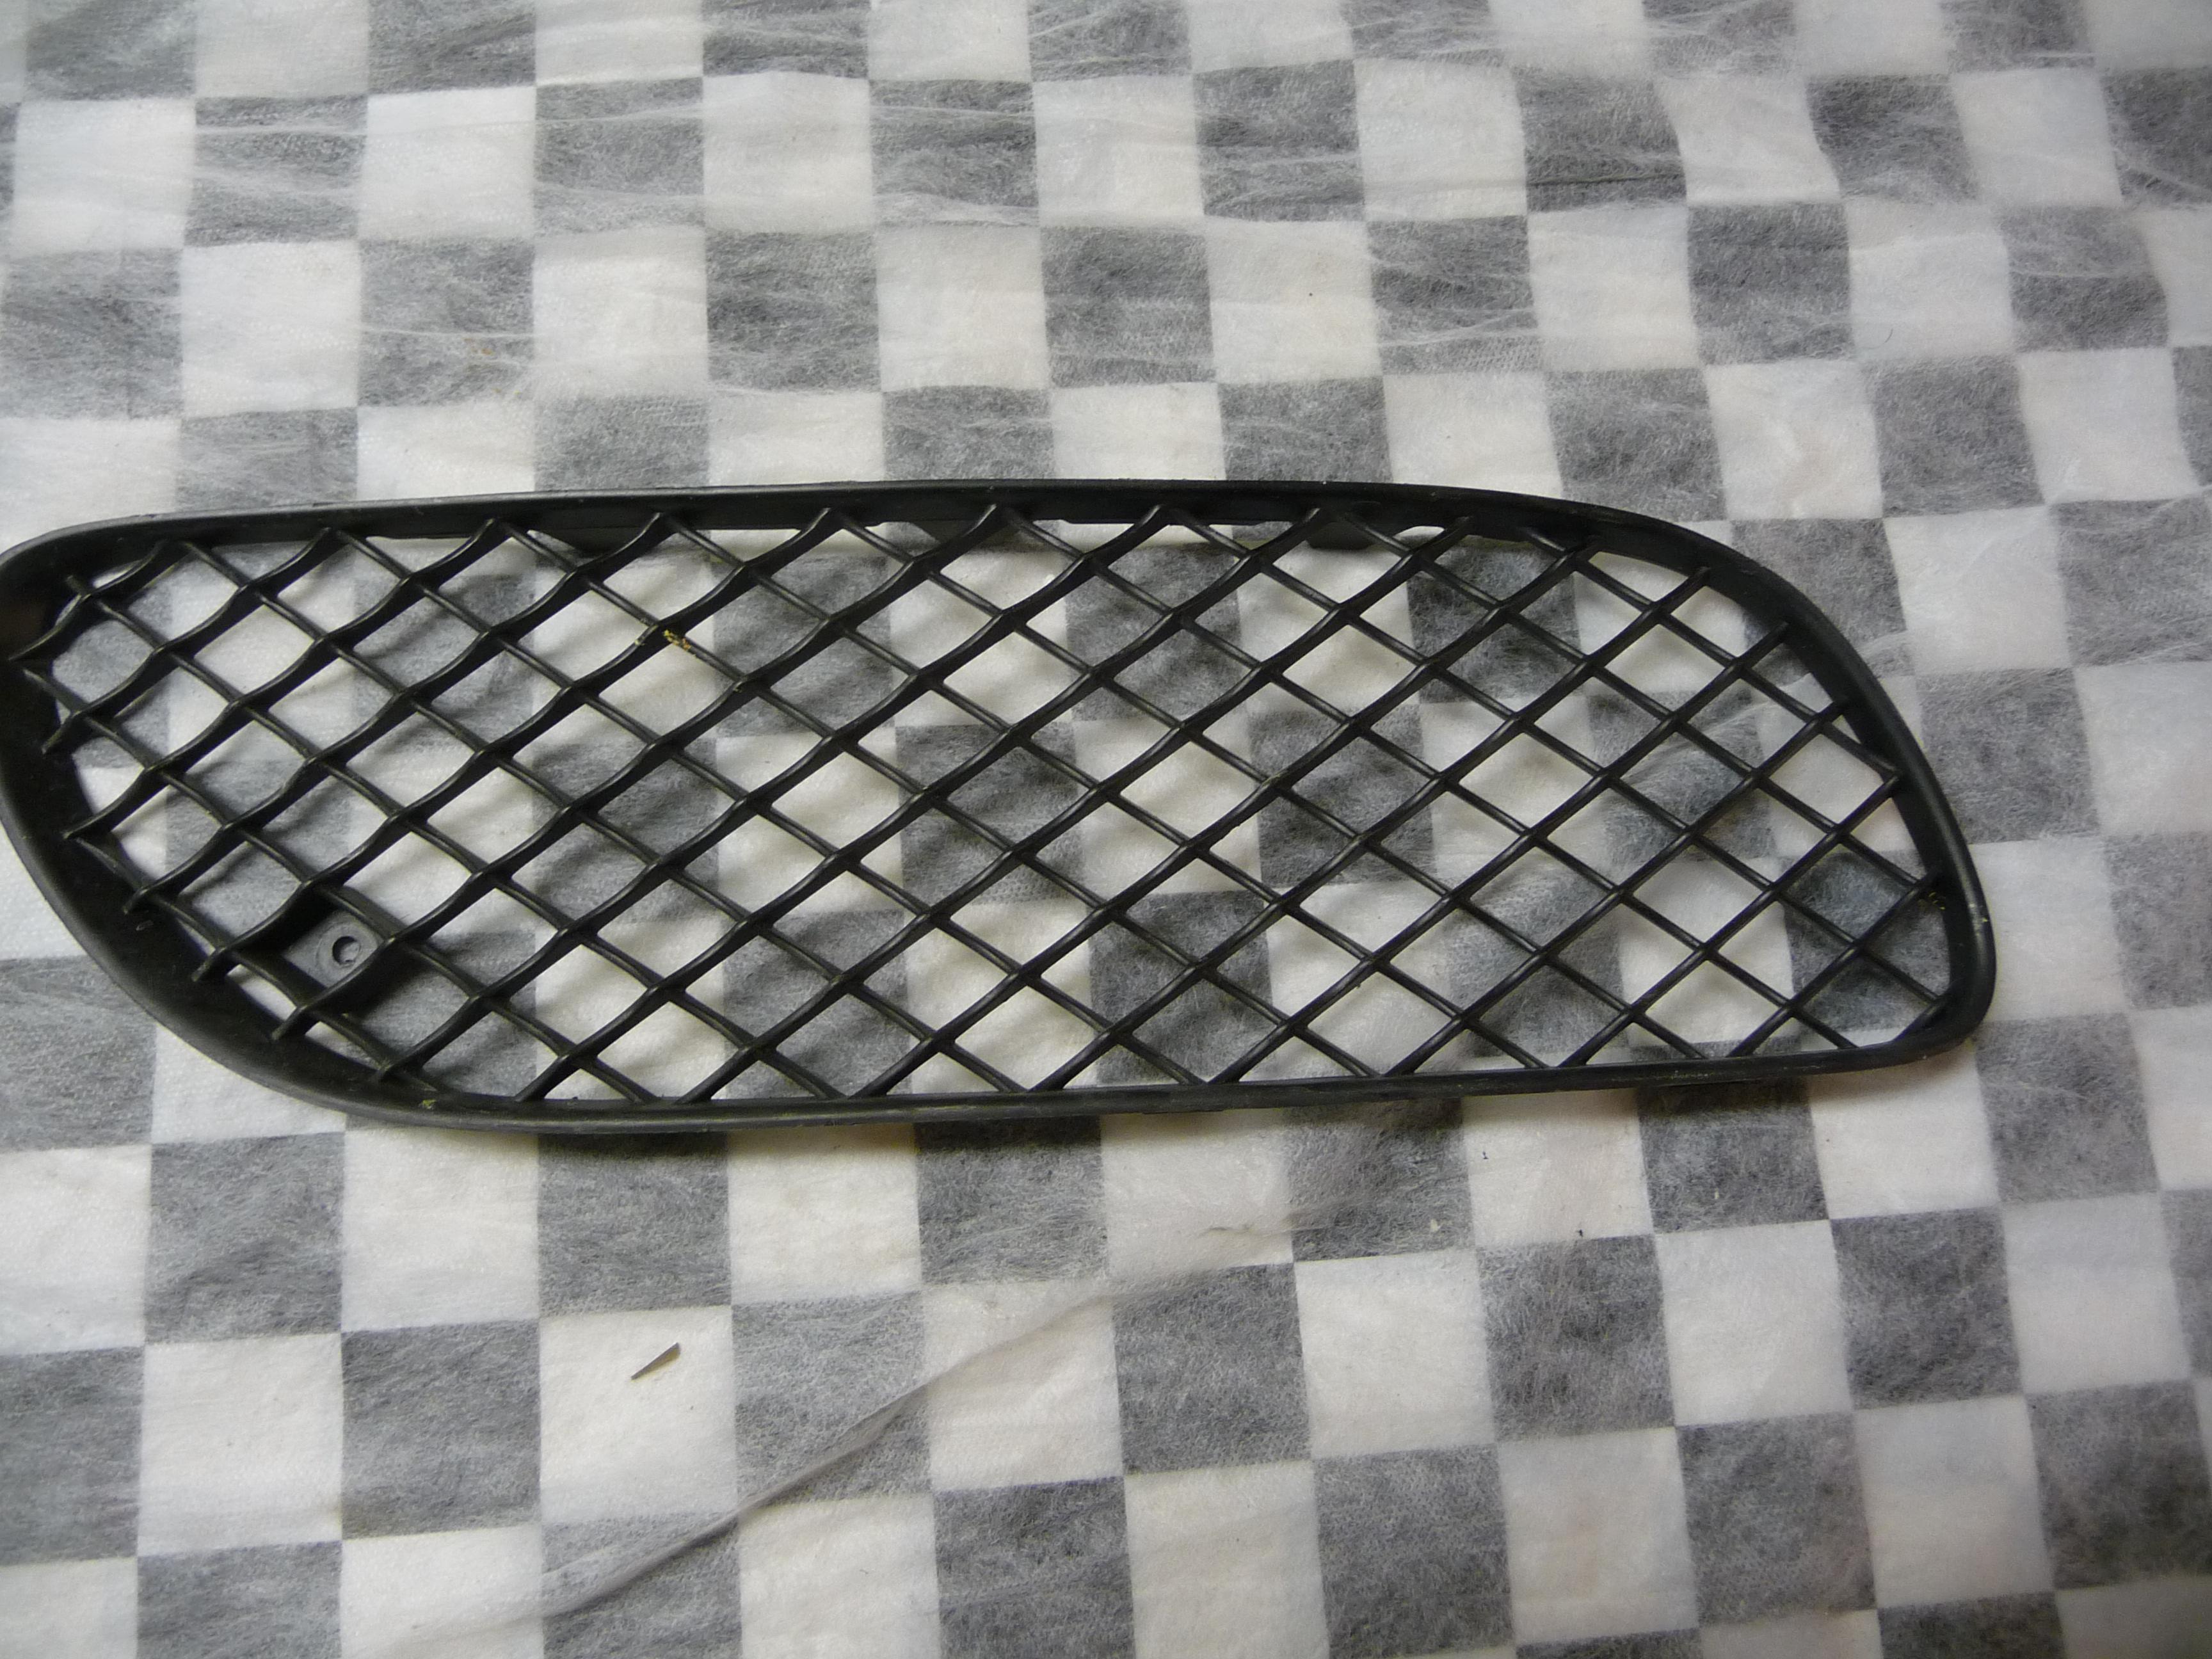 Bentley Continental GT GTC Front Bumper Right Grille Black Plastic  3W8807682A - Used Auto Parts Store | LA Global Parts